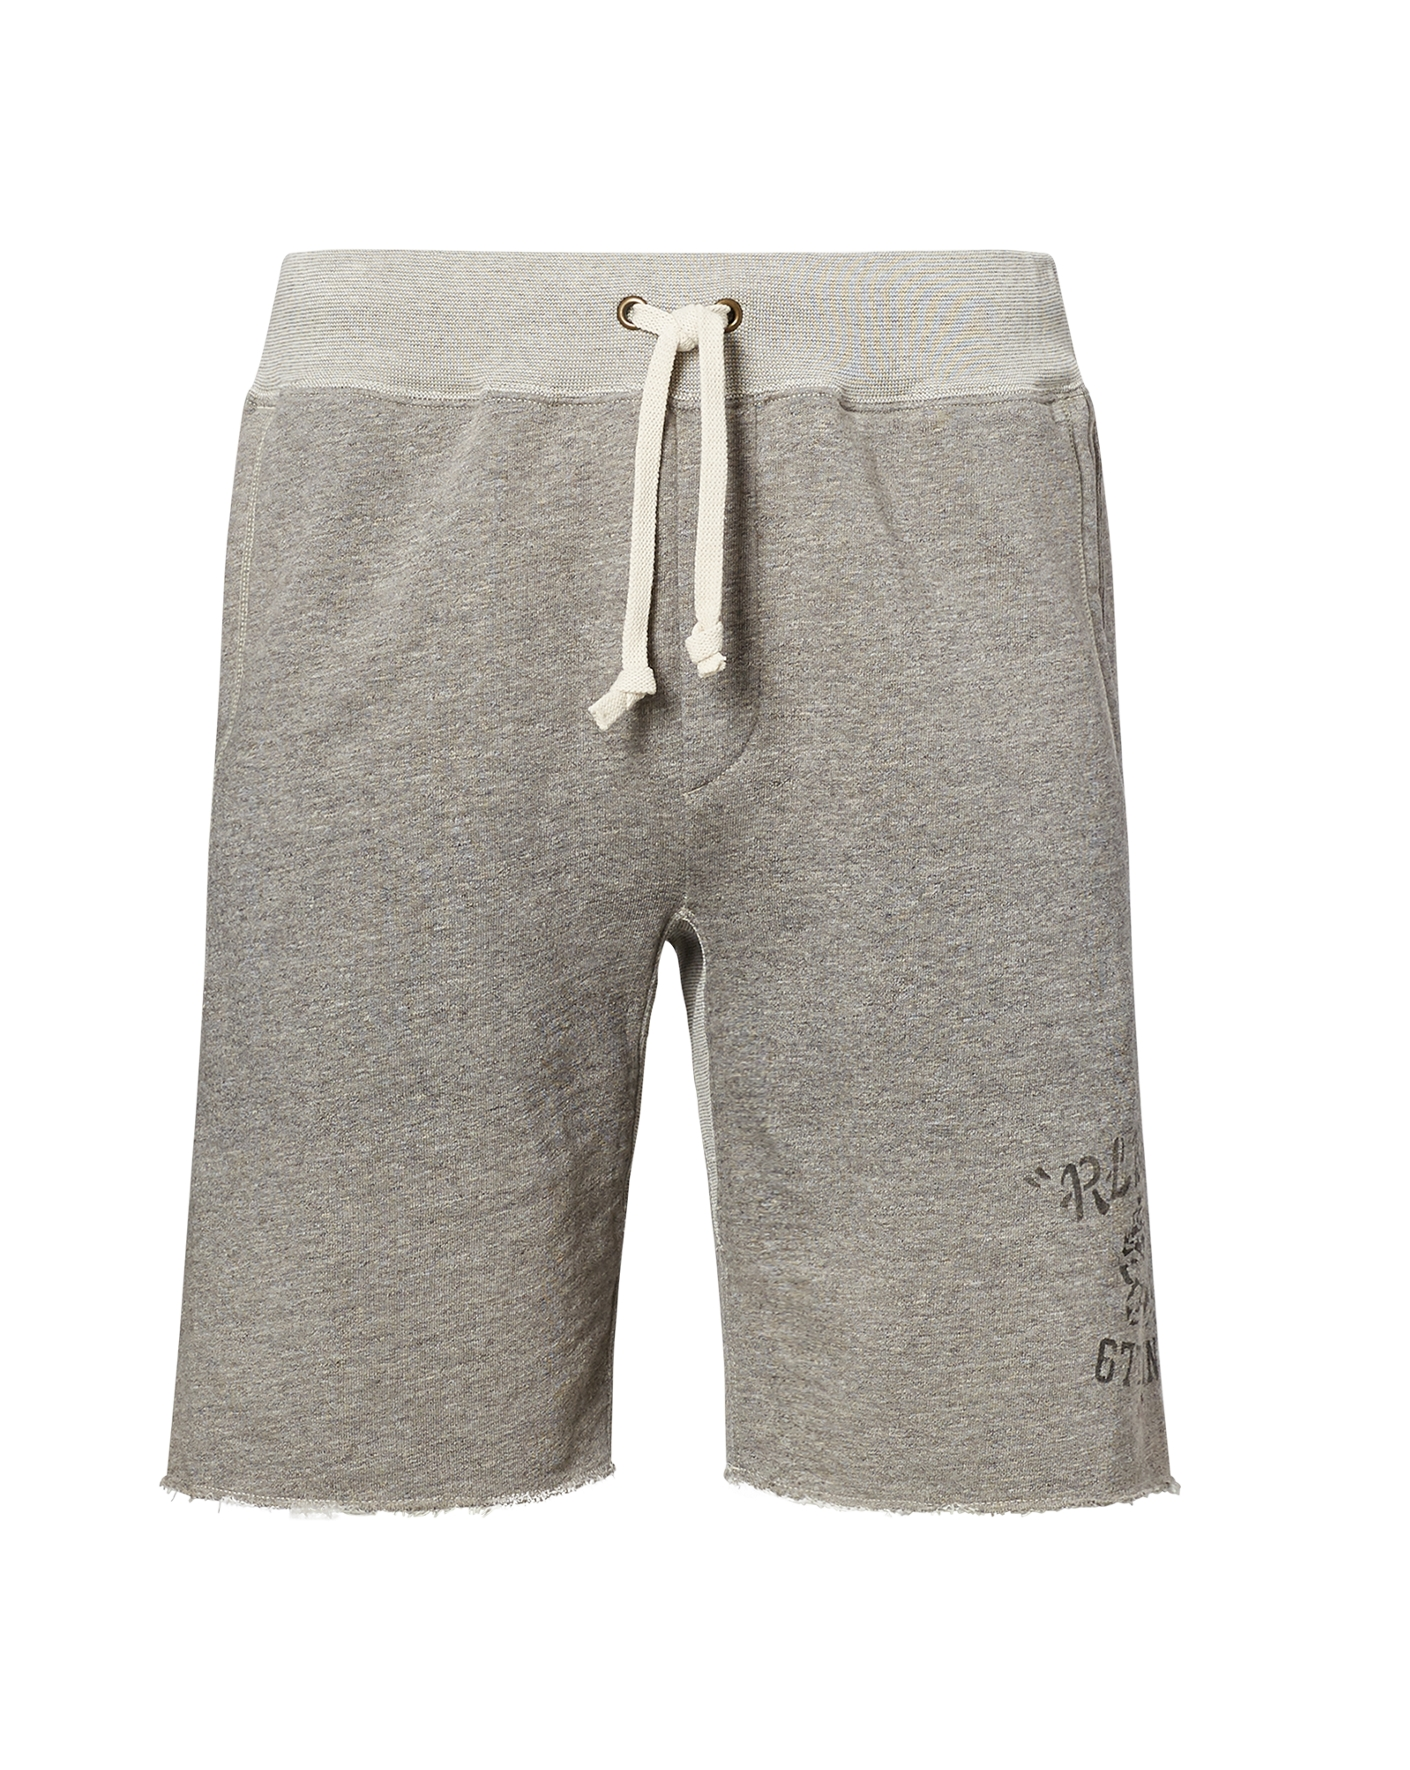 Men's Polo Shorts - Dress, Khaki, & More   Ralph Lauren